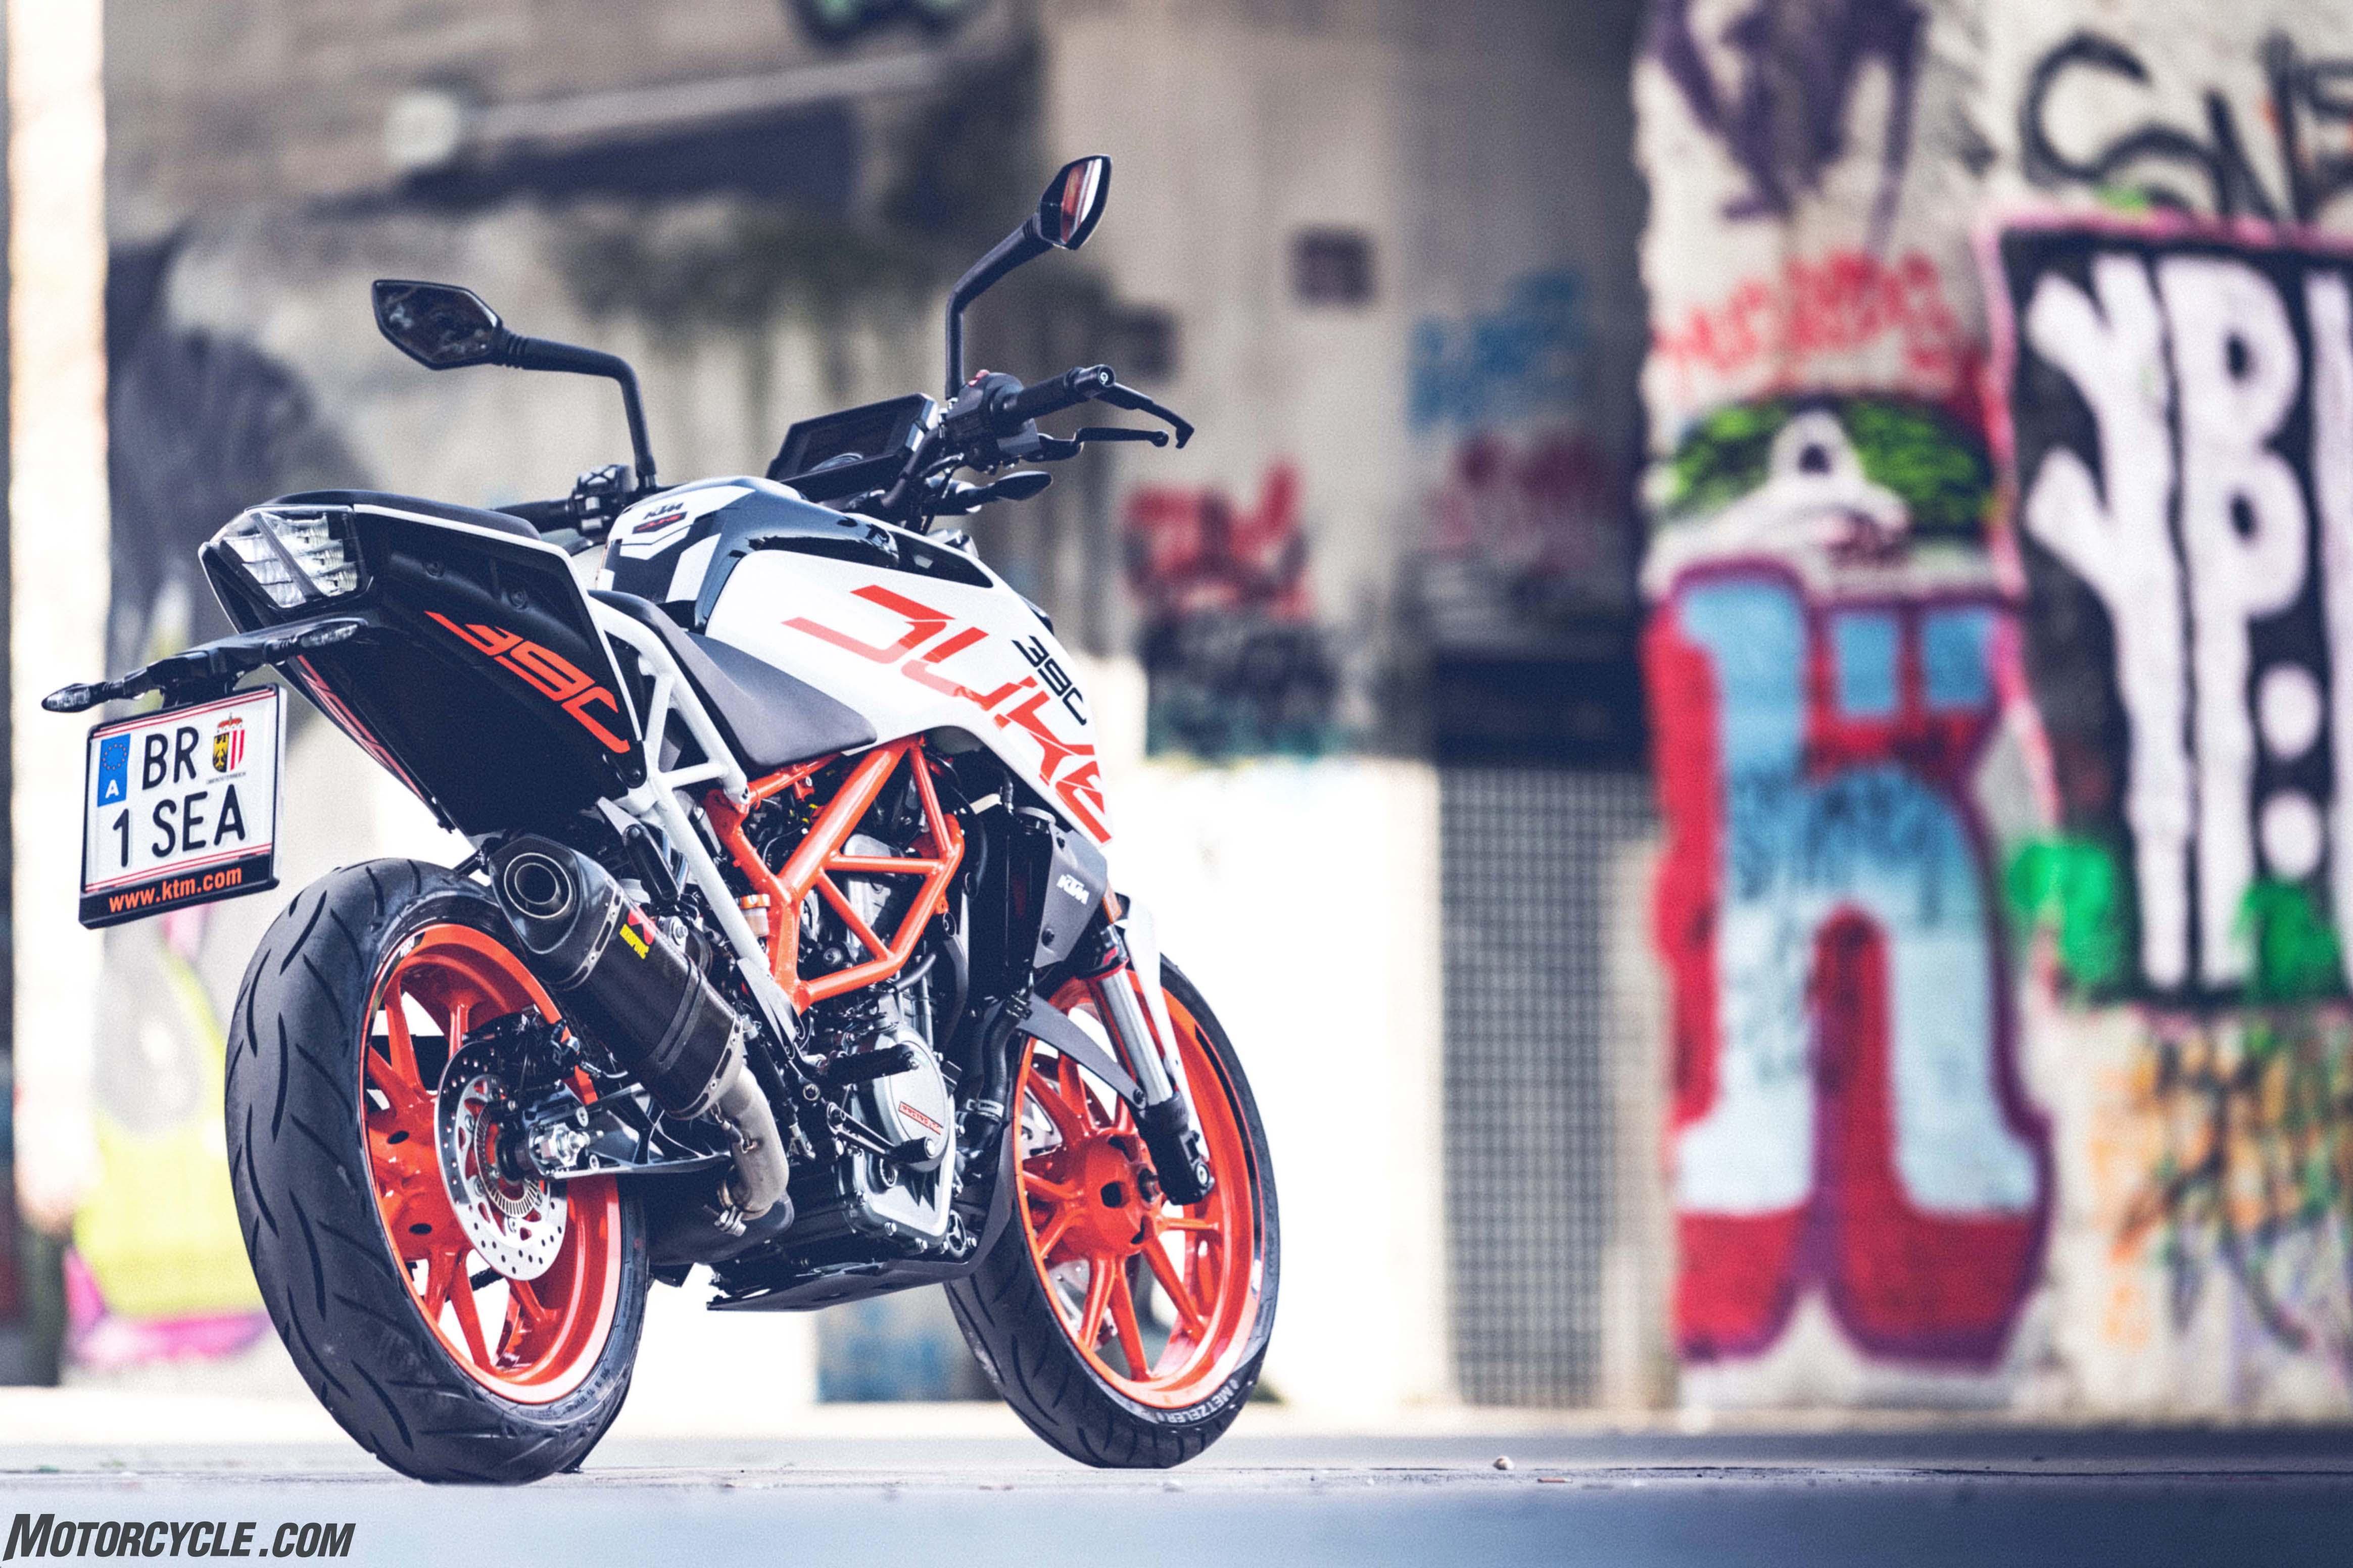 041017 2017 ktm 390 duke  mc57559   Motorcyclecom 4657x3104